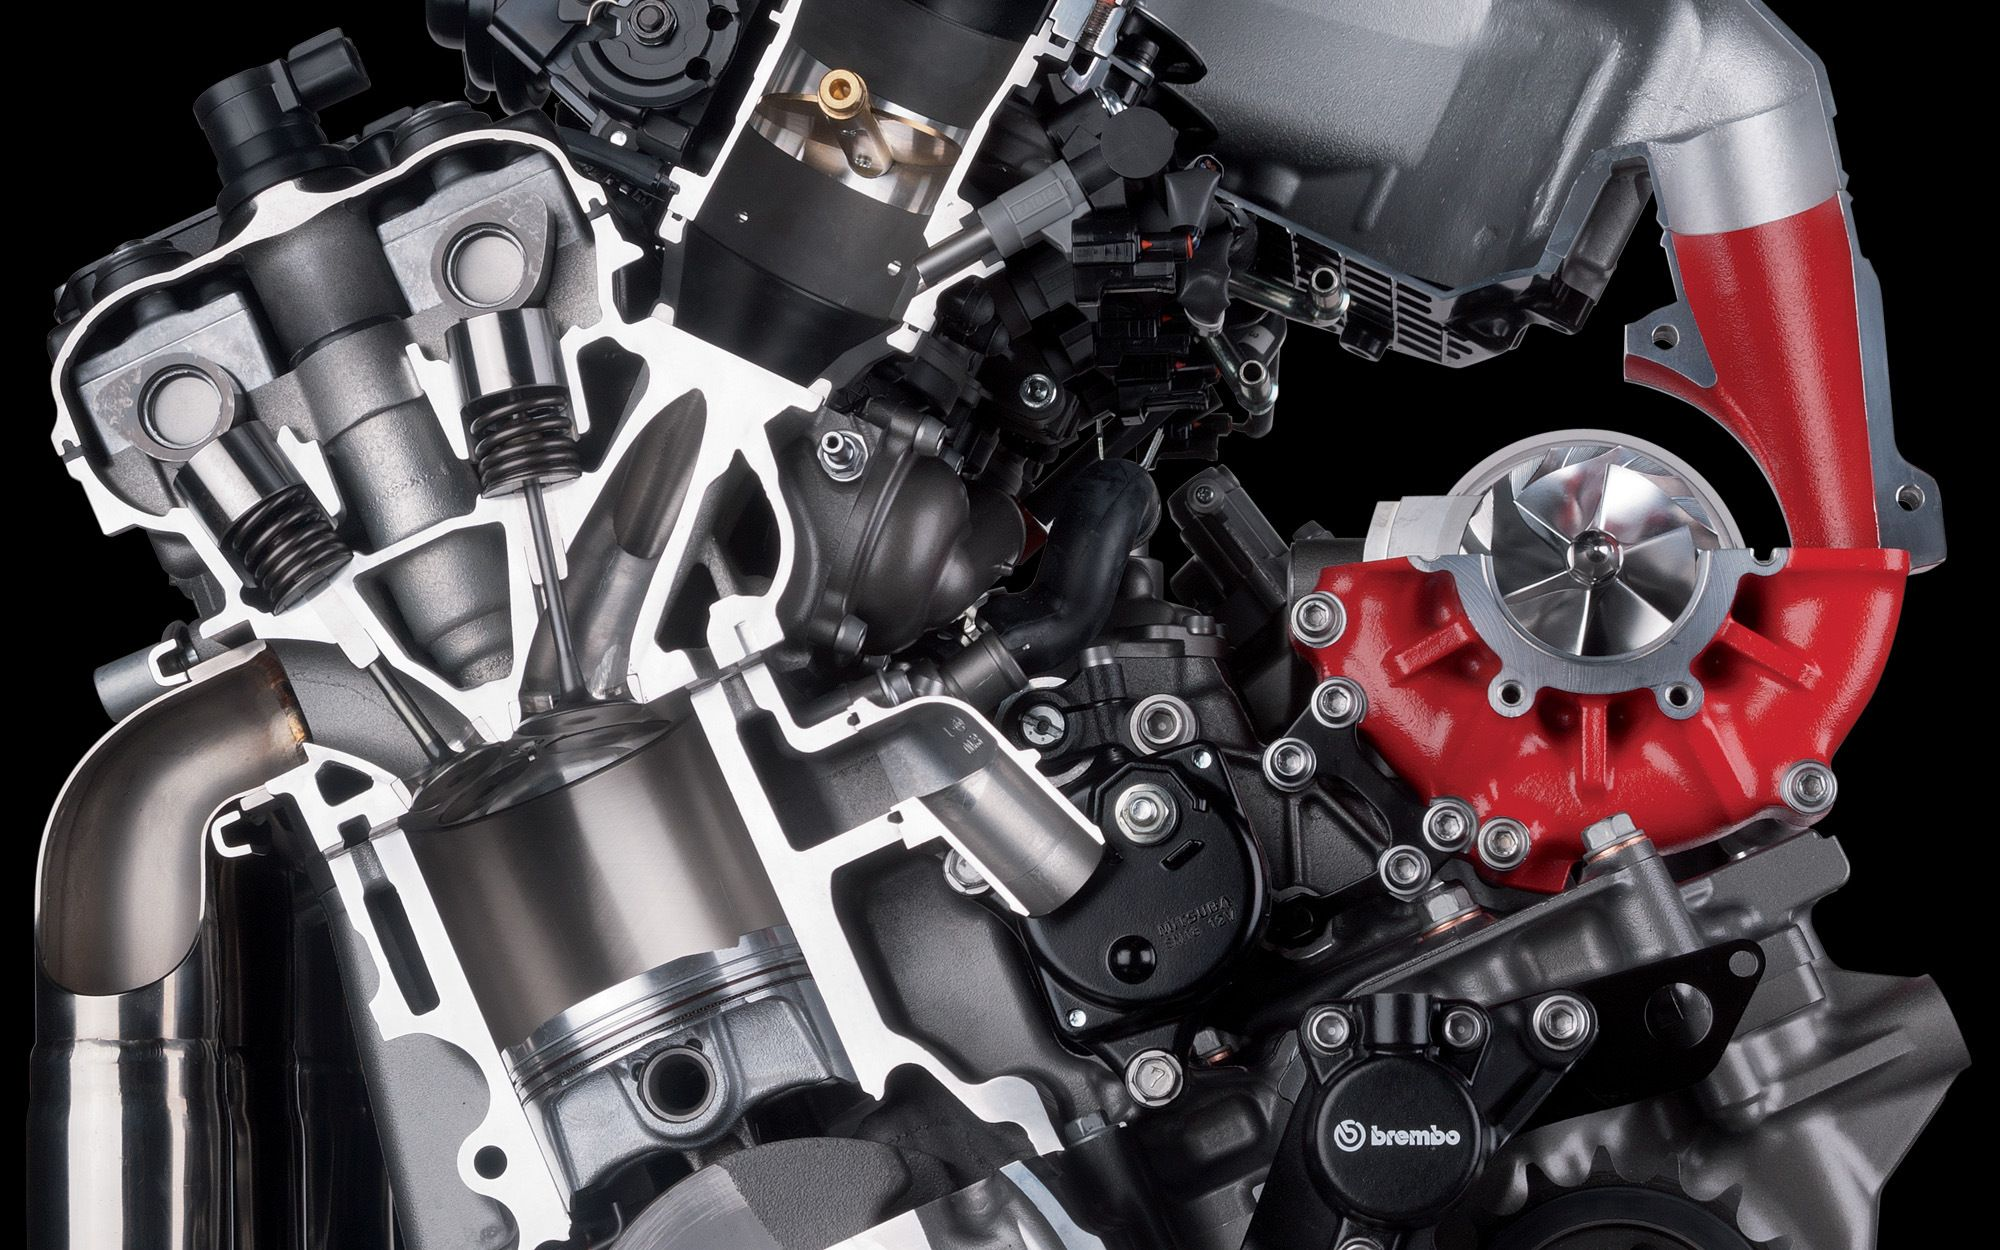 Kawasaki H2 Engine Cutout Compressor And A Brembo Part Engines Z1 900 Diagram